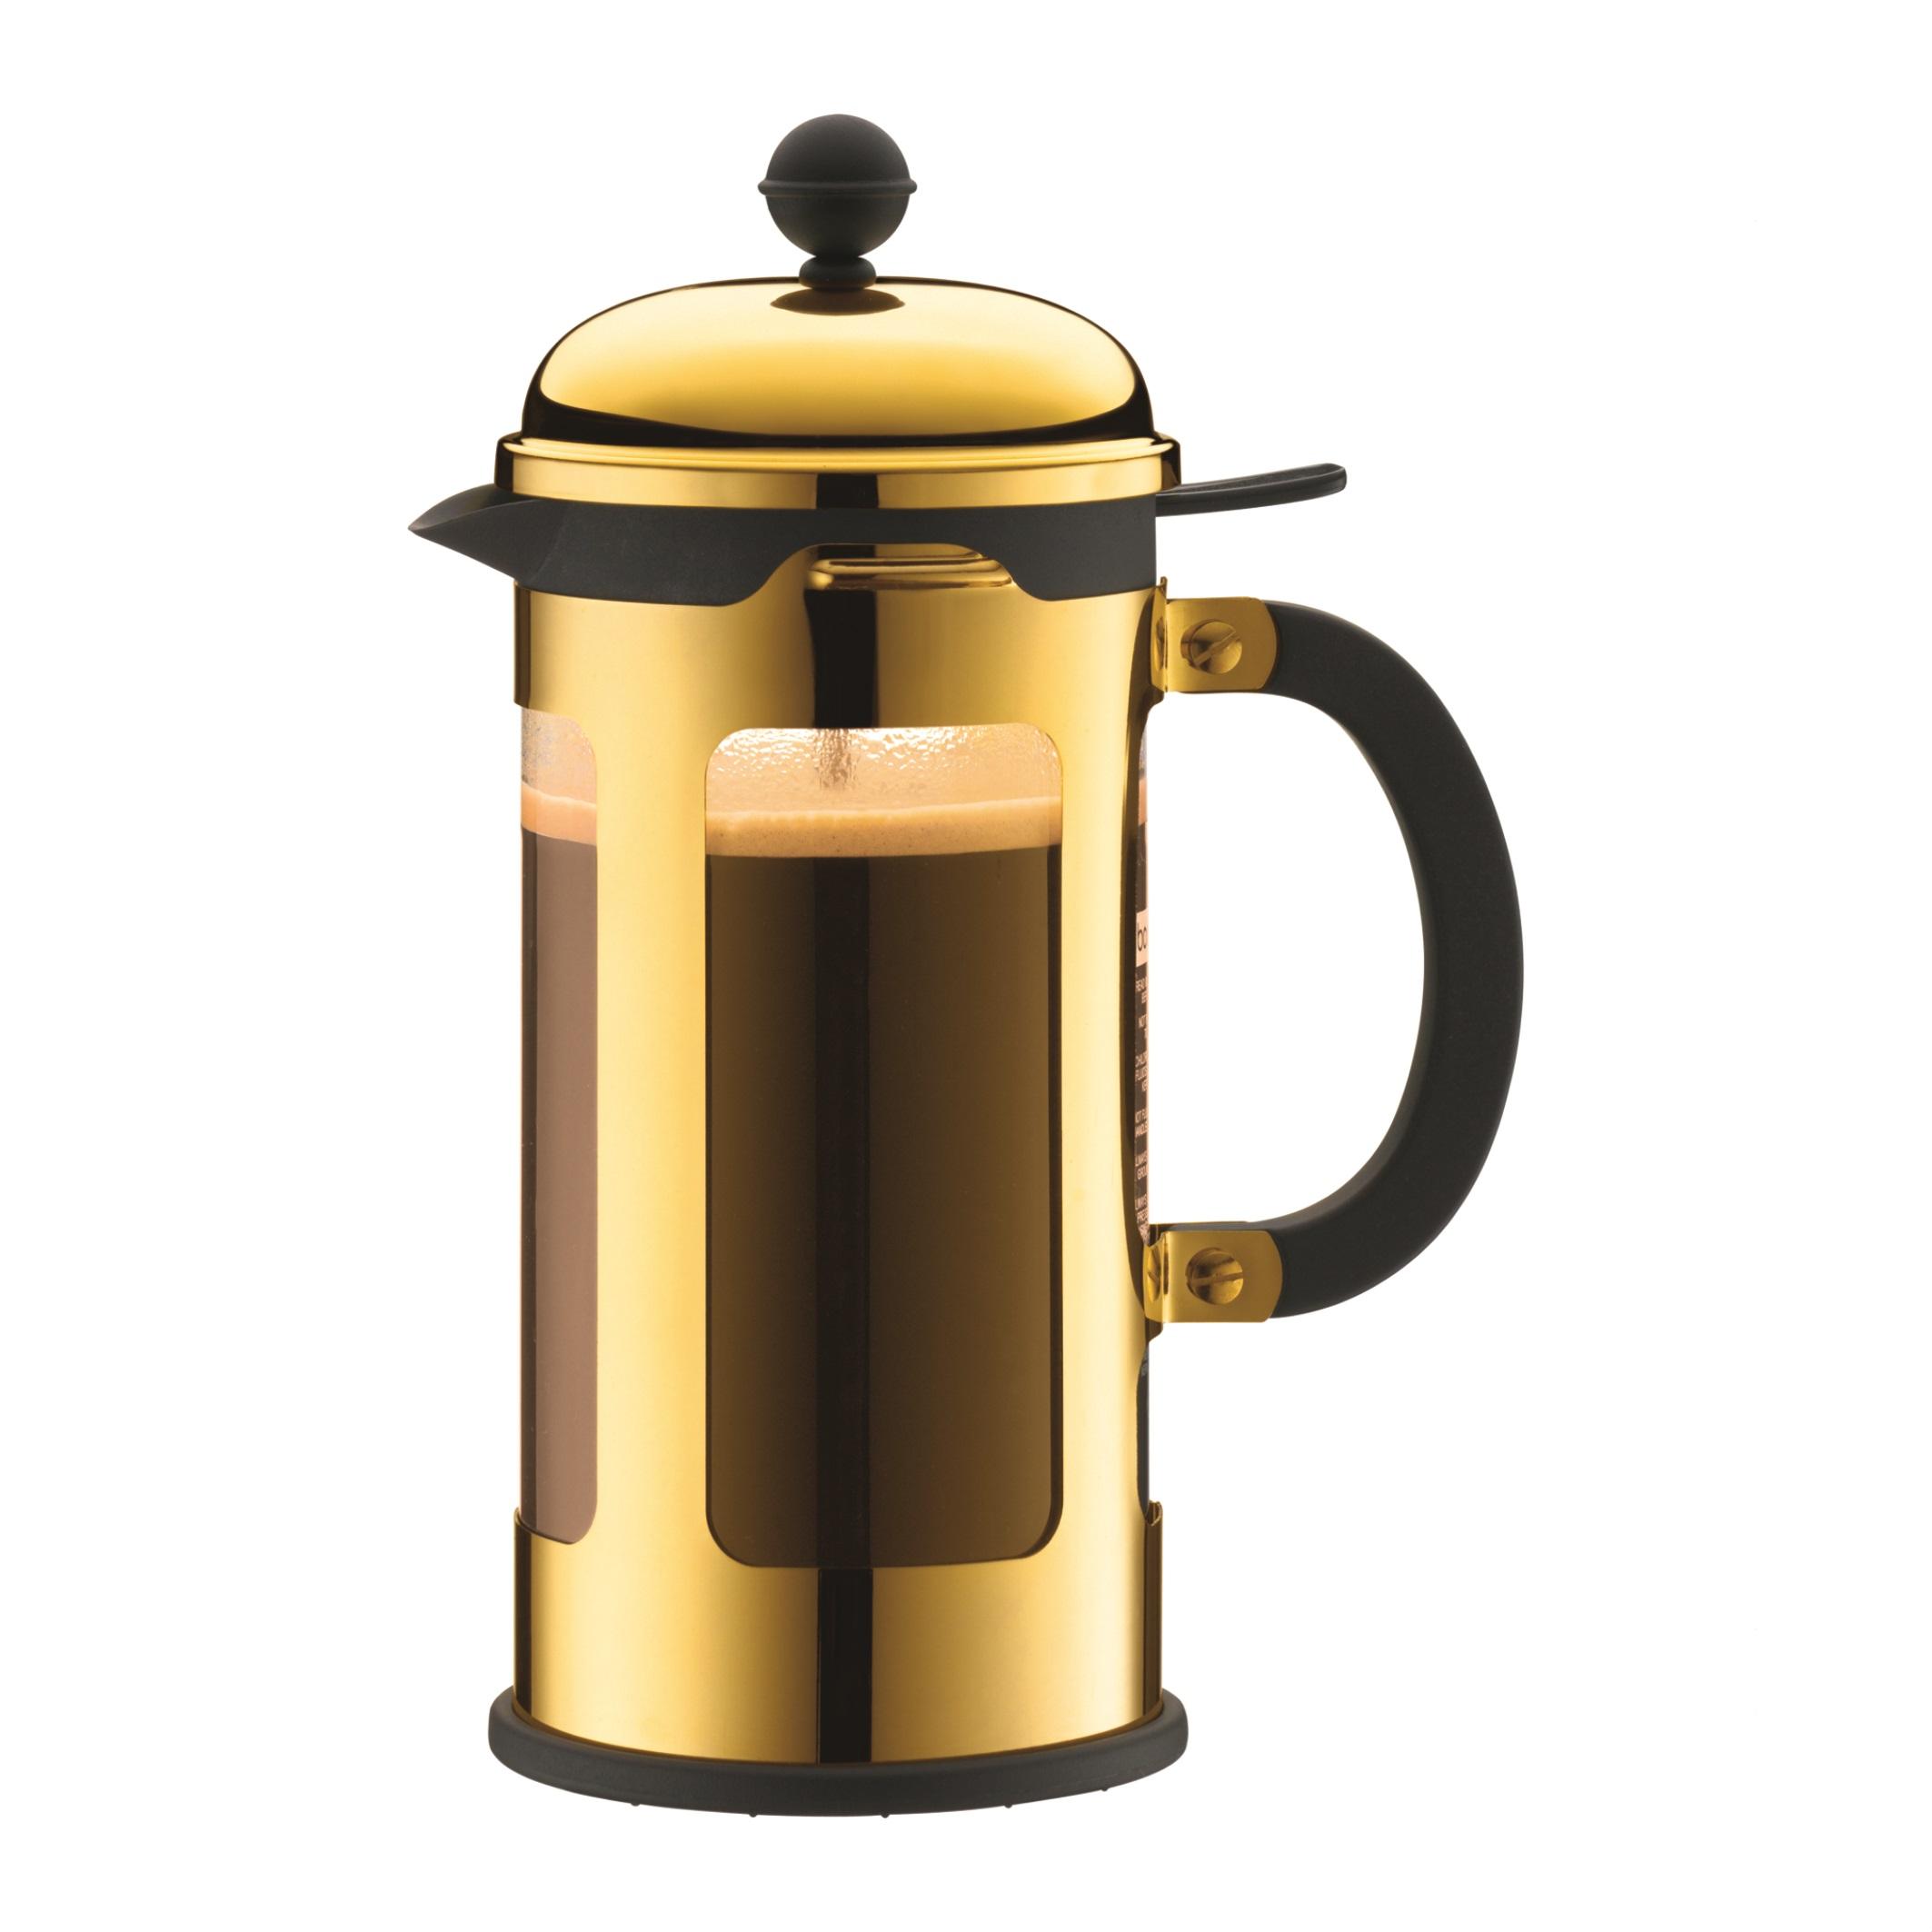 Bodum Cafeti?re Chambord Goud 1 Liter